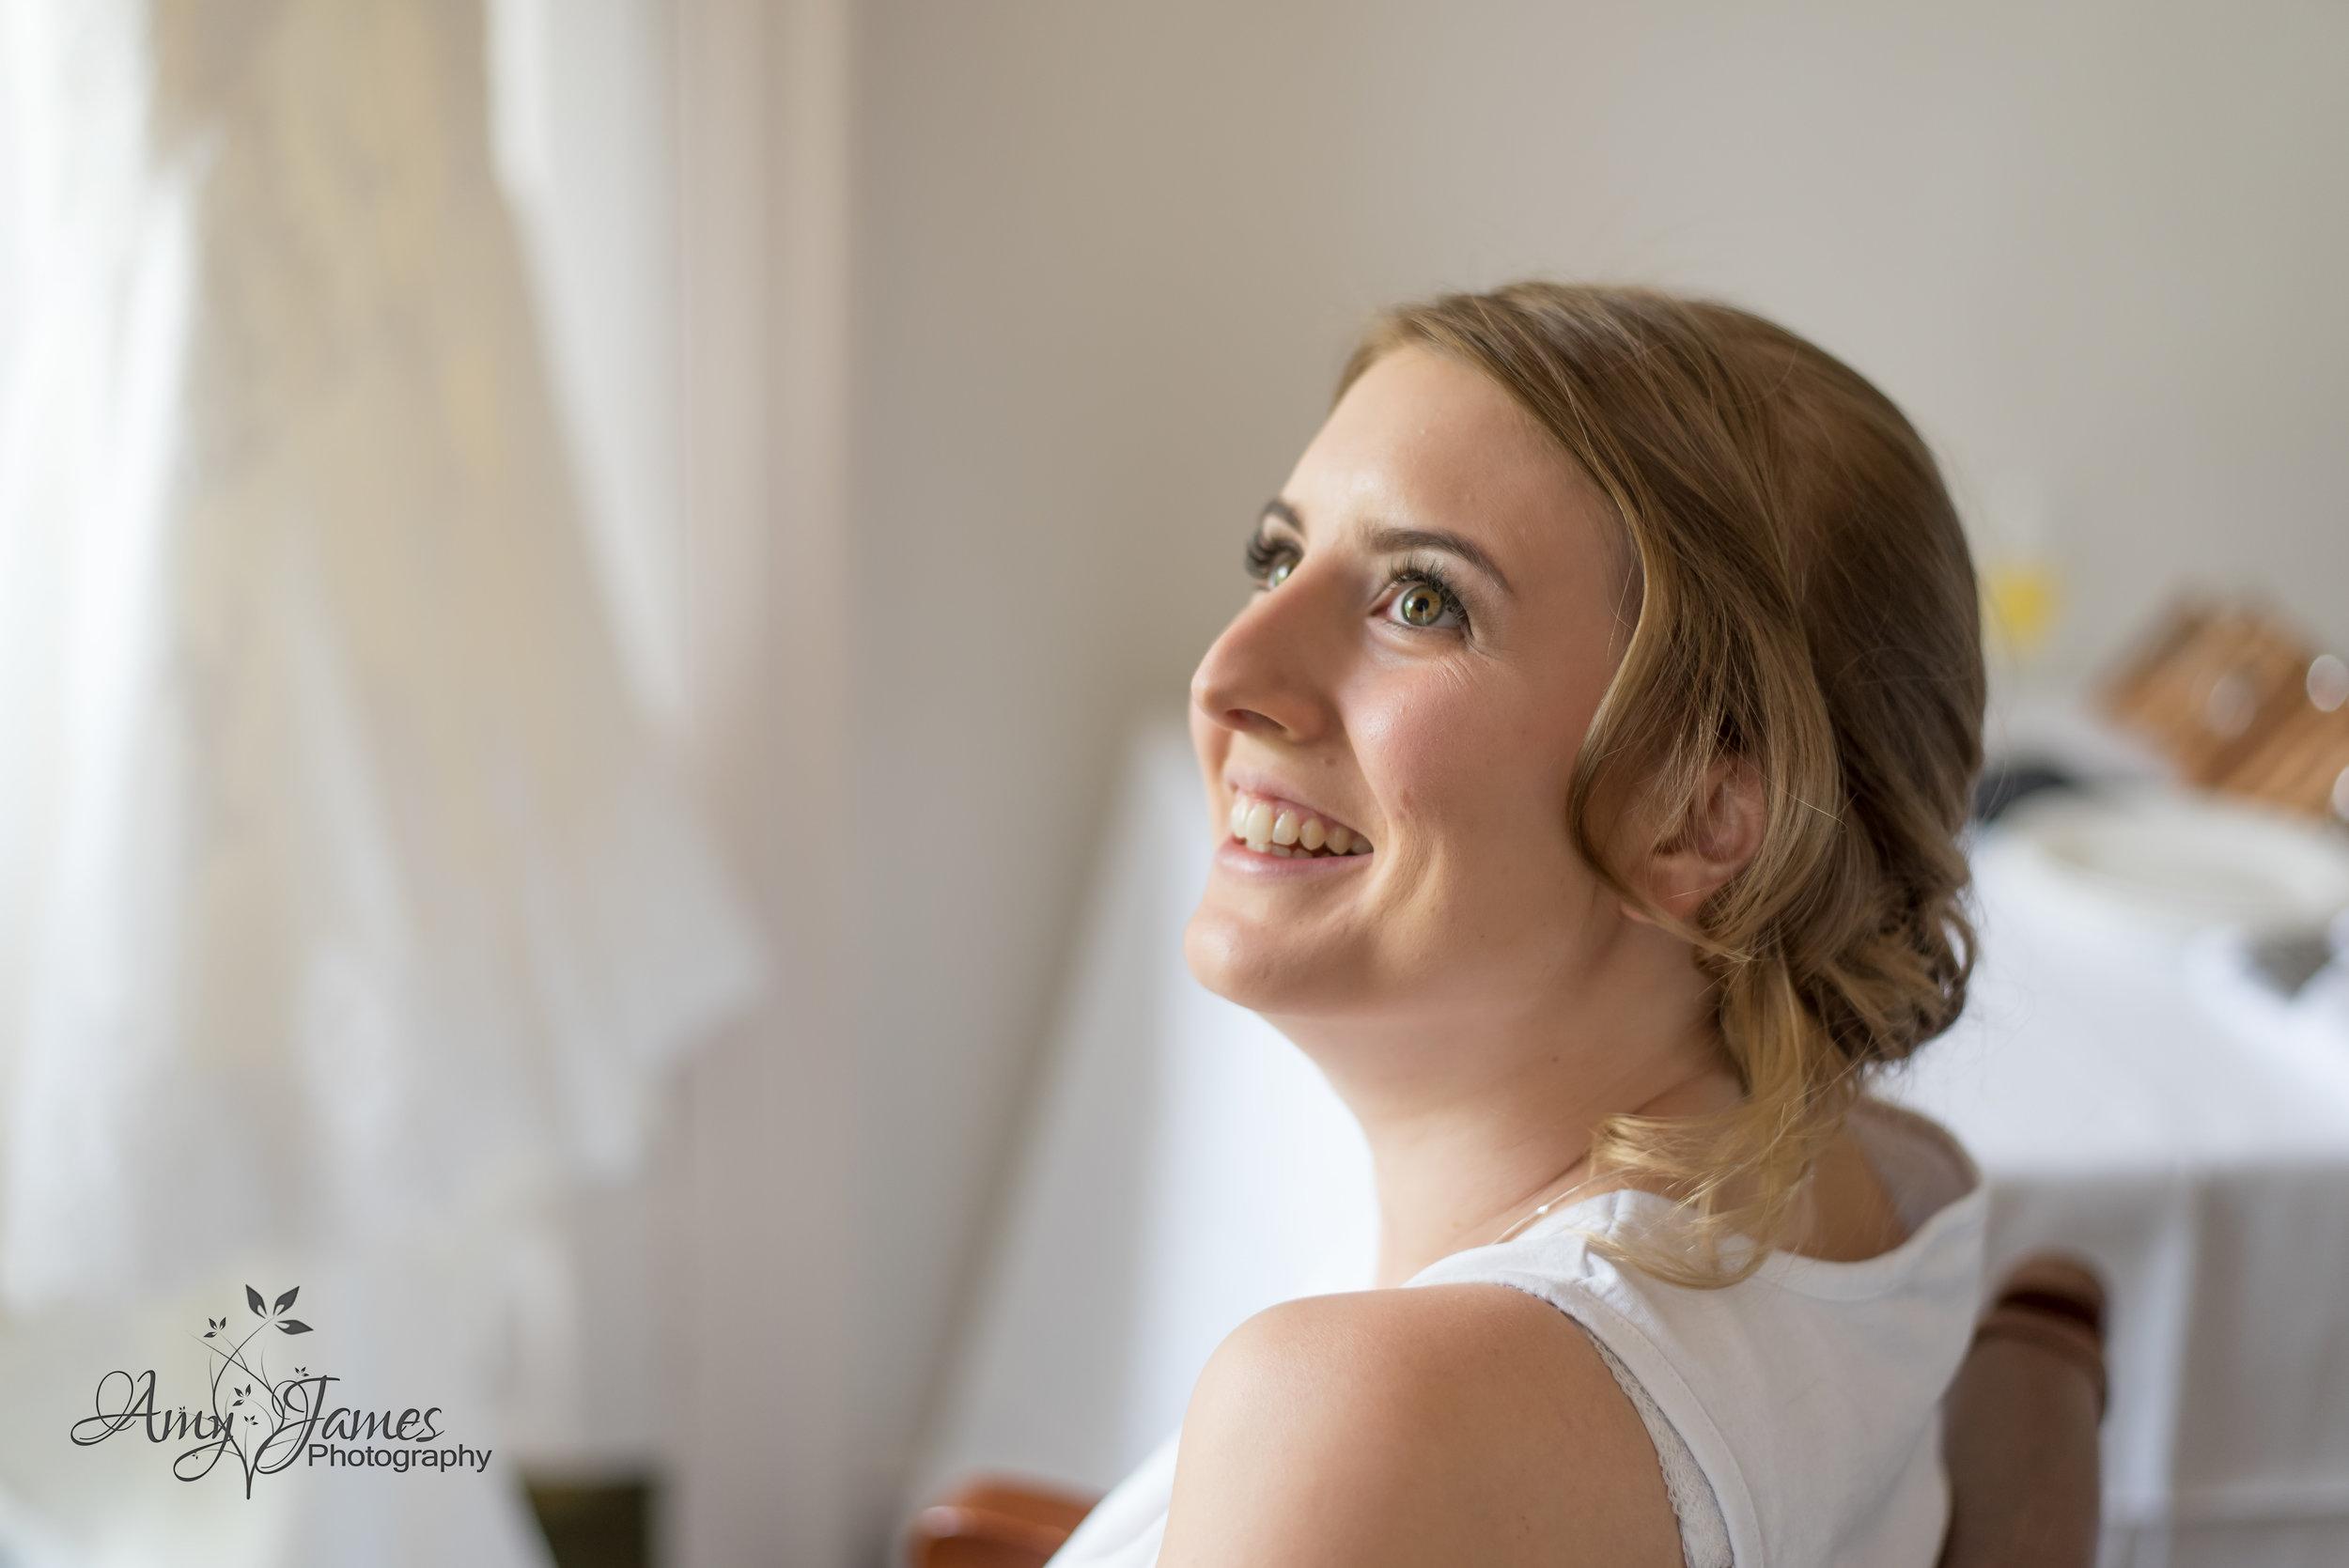 Hampshire Wedding Photographer | Surrey wedding photographer | Highfield Park wedding venue | Highfield Park wedding photographer | Amy James Photography